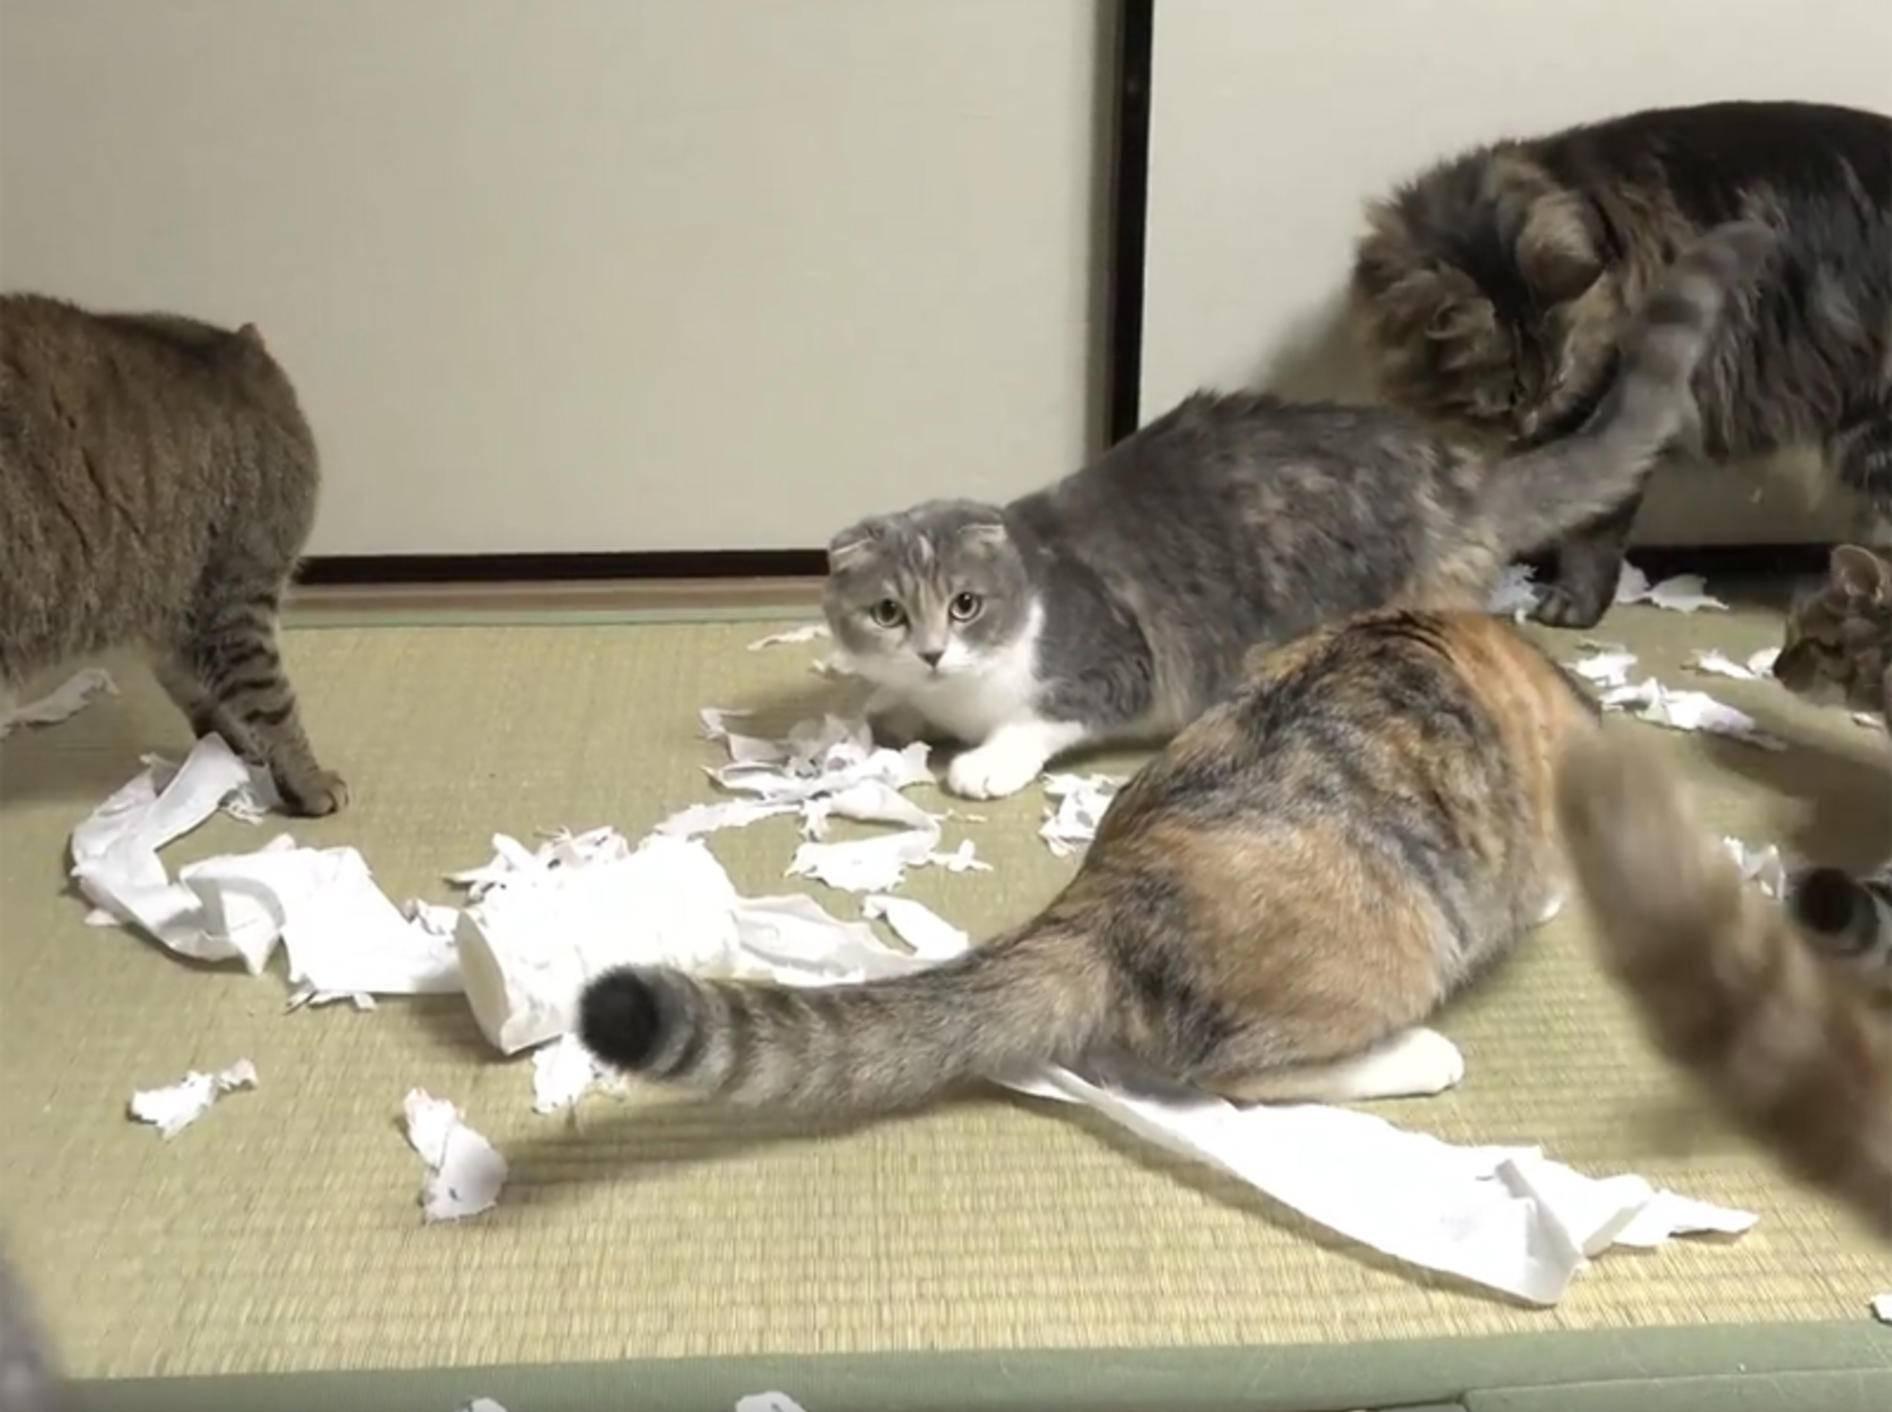 Katzen feiern Toilettenpapier-Zerstörungsparty – YouTube / 10 Cats.